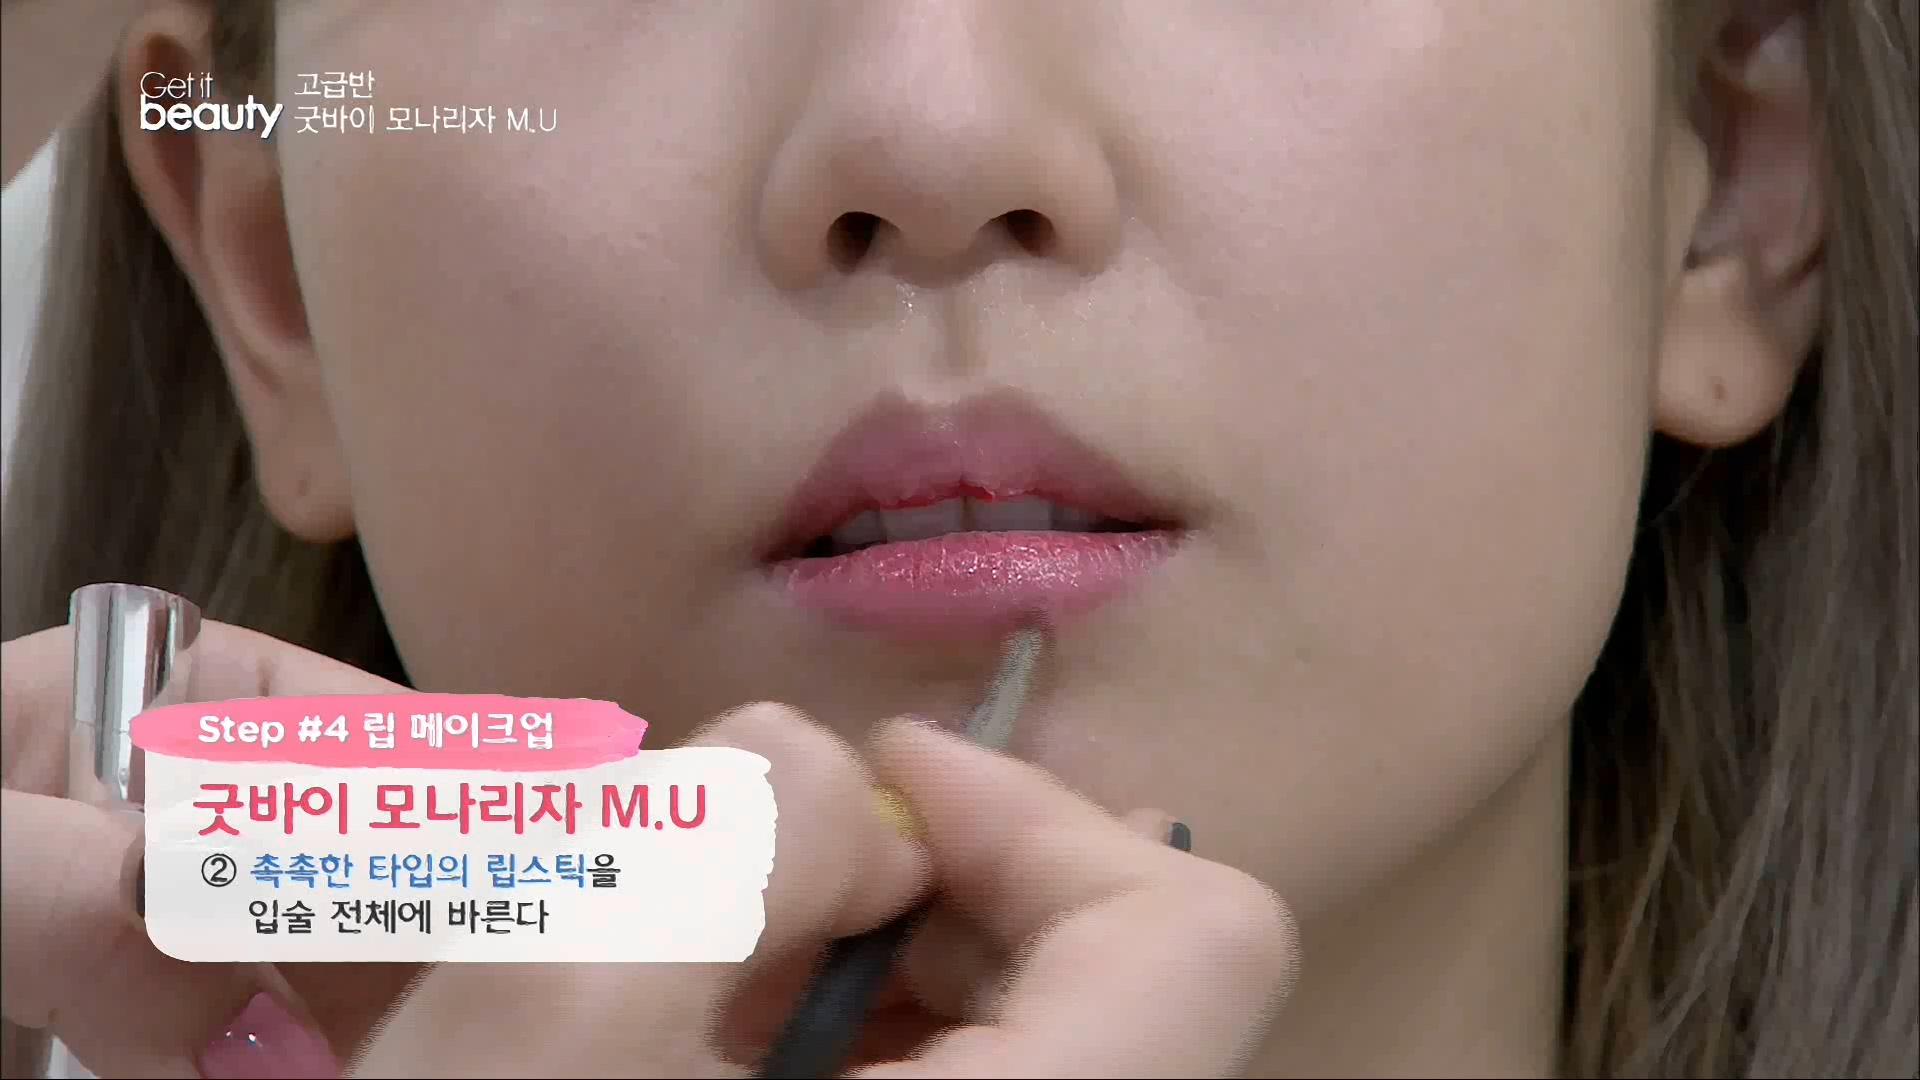 Step#4 립 메이크업 2.촉촉한 타입의 립스틱을 입술 전체에 바른다.